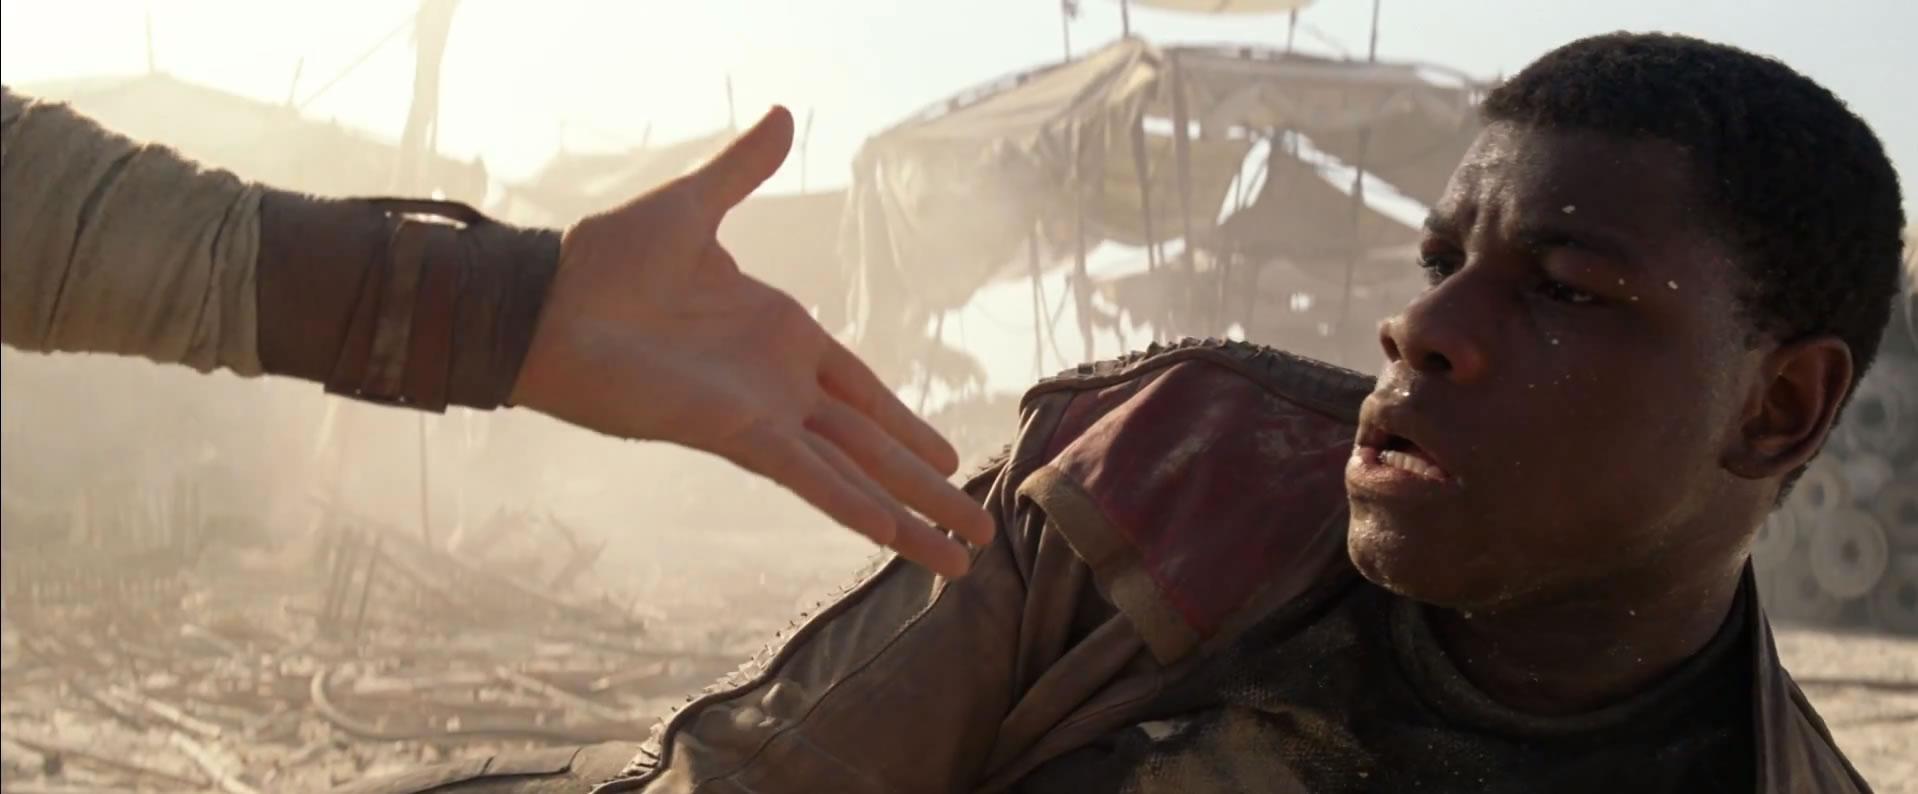 star-wars-7-force-awakens-trailer-screengrab-19.jpg